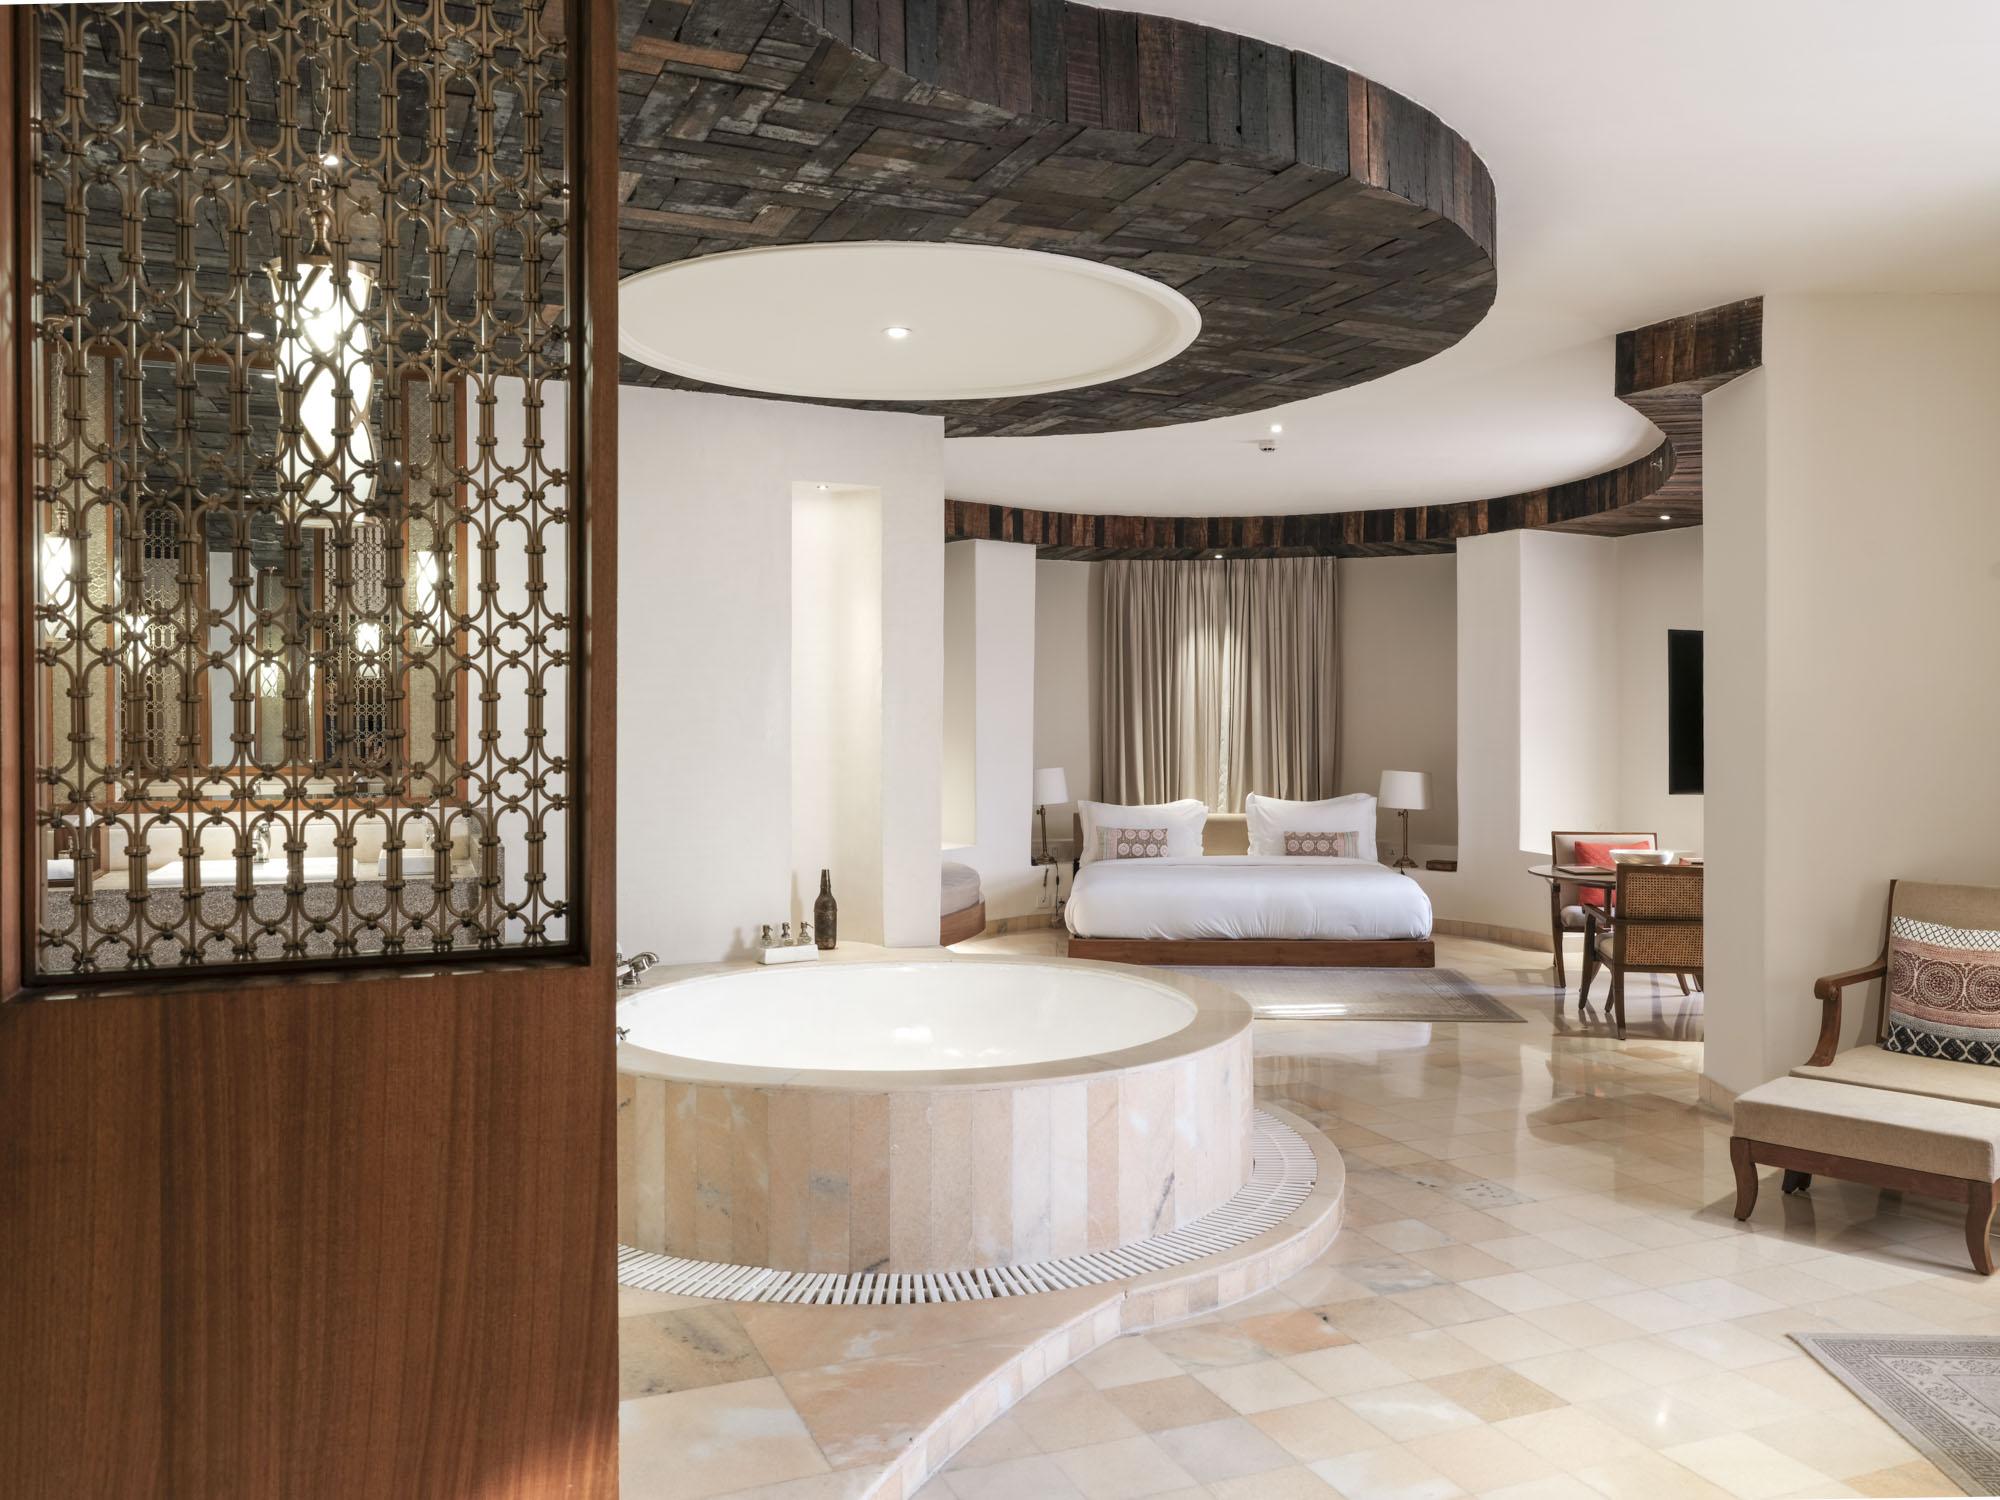 Hospitality hotel resort luxurious luxury photography services singapore asia photographer travel Hyatt Alila Fort Bishangarh Jaipur India 4